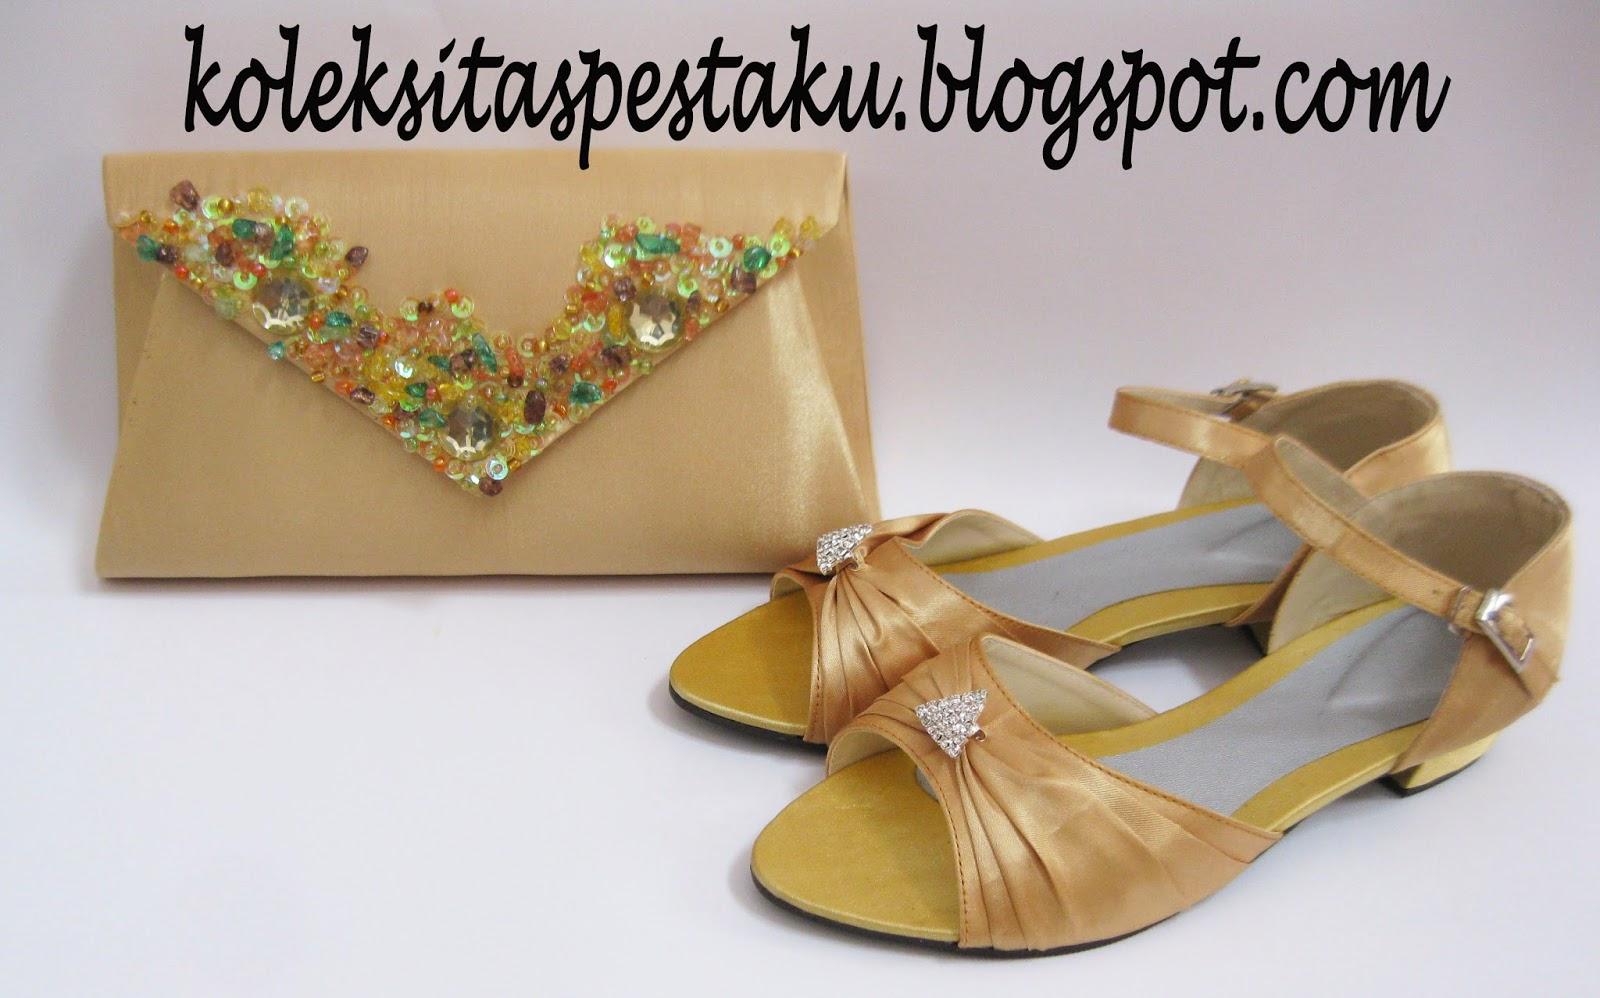 Dompet dan Sepatu Pesta Hak Tahu Warna Gold Cantik dari Tas Pesta Ku